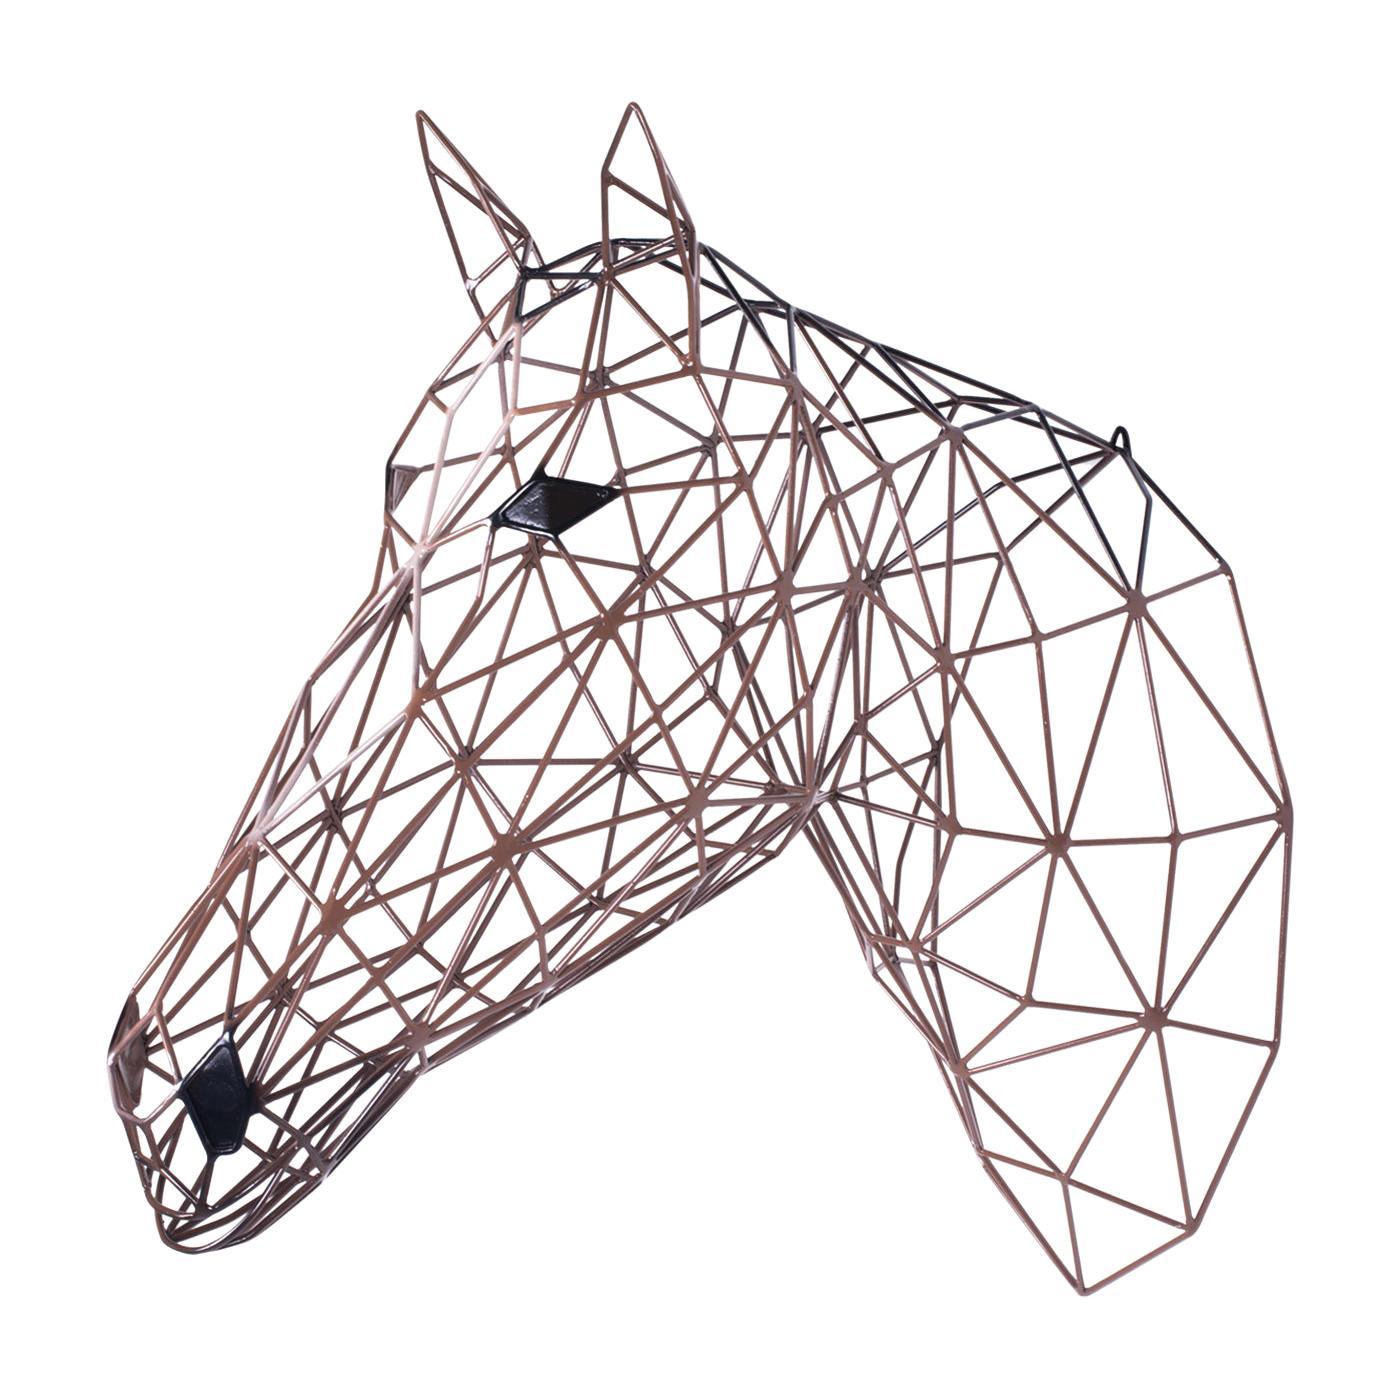 Brown Horse Iron Sculpture